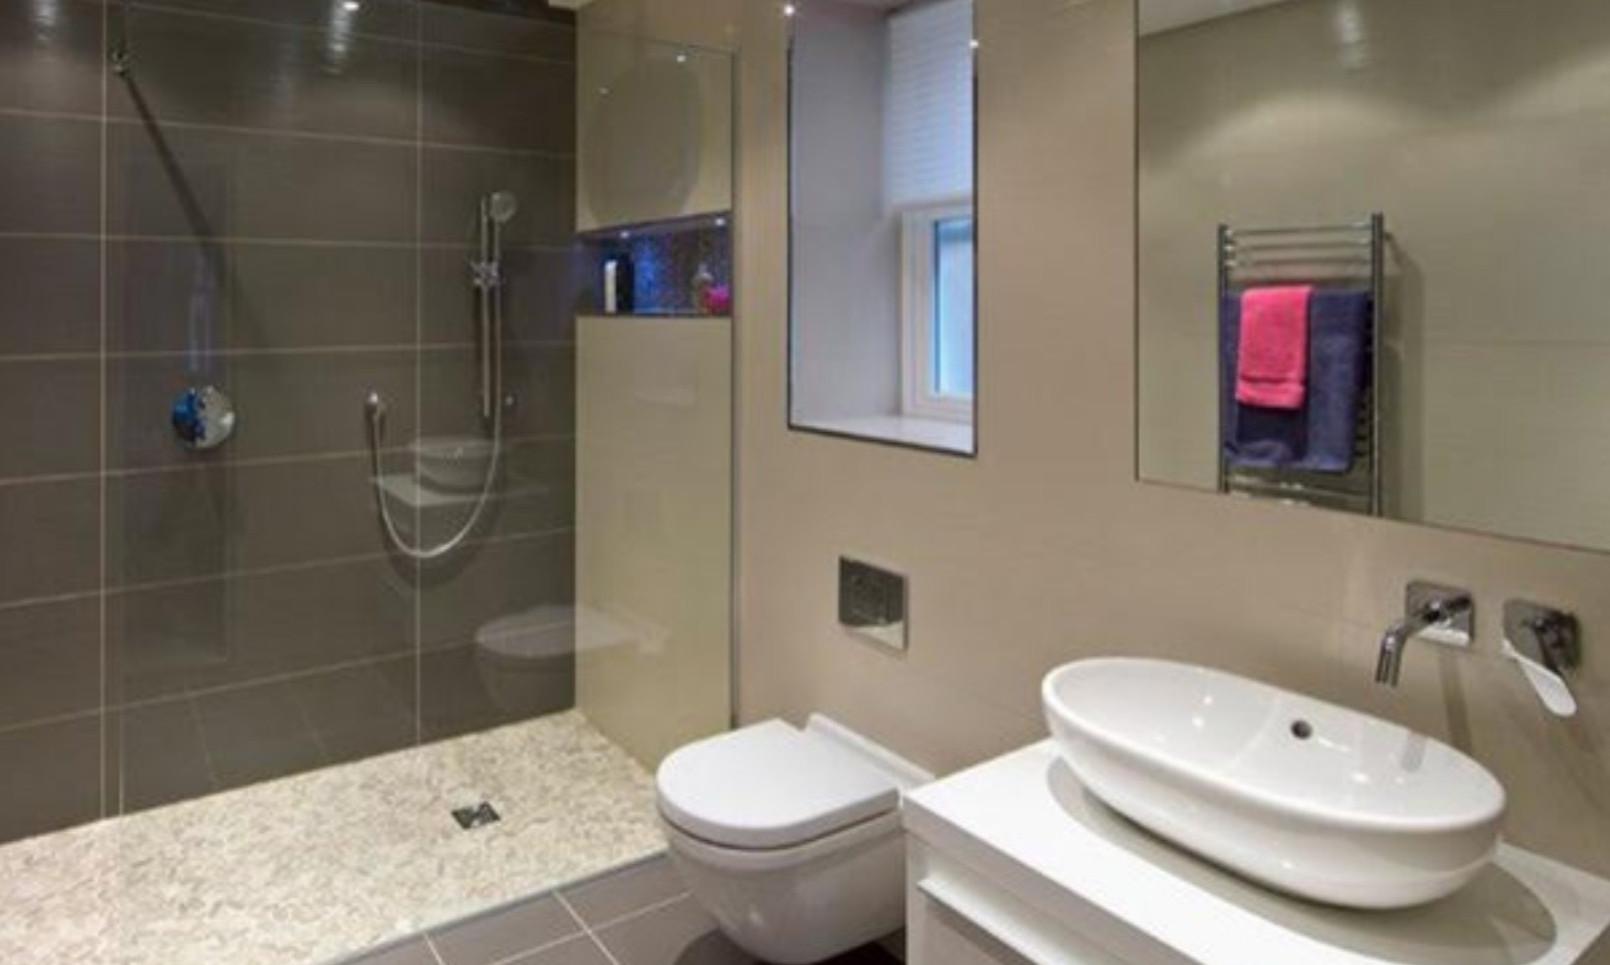 Bathroom sample 2